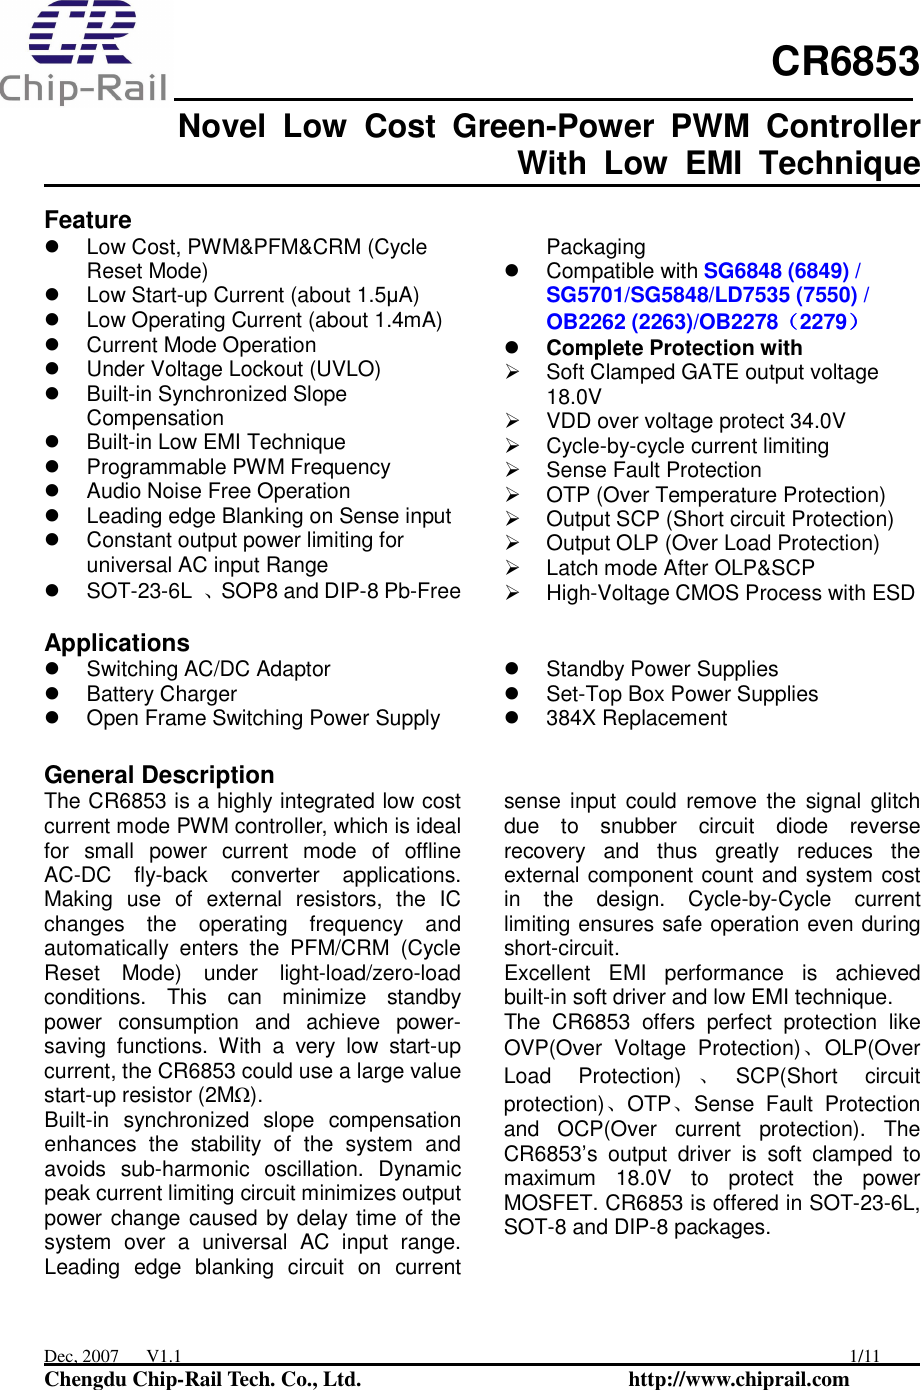 CR6853 Datasheet  Www s manuals com  Chip rail